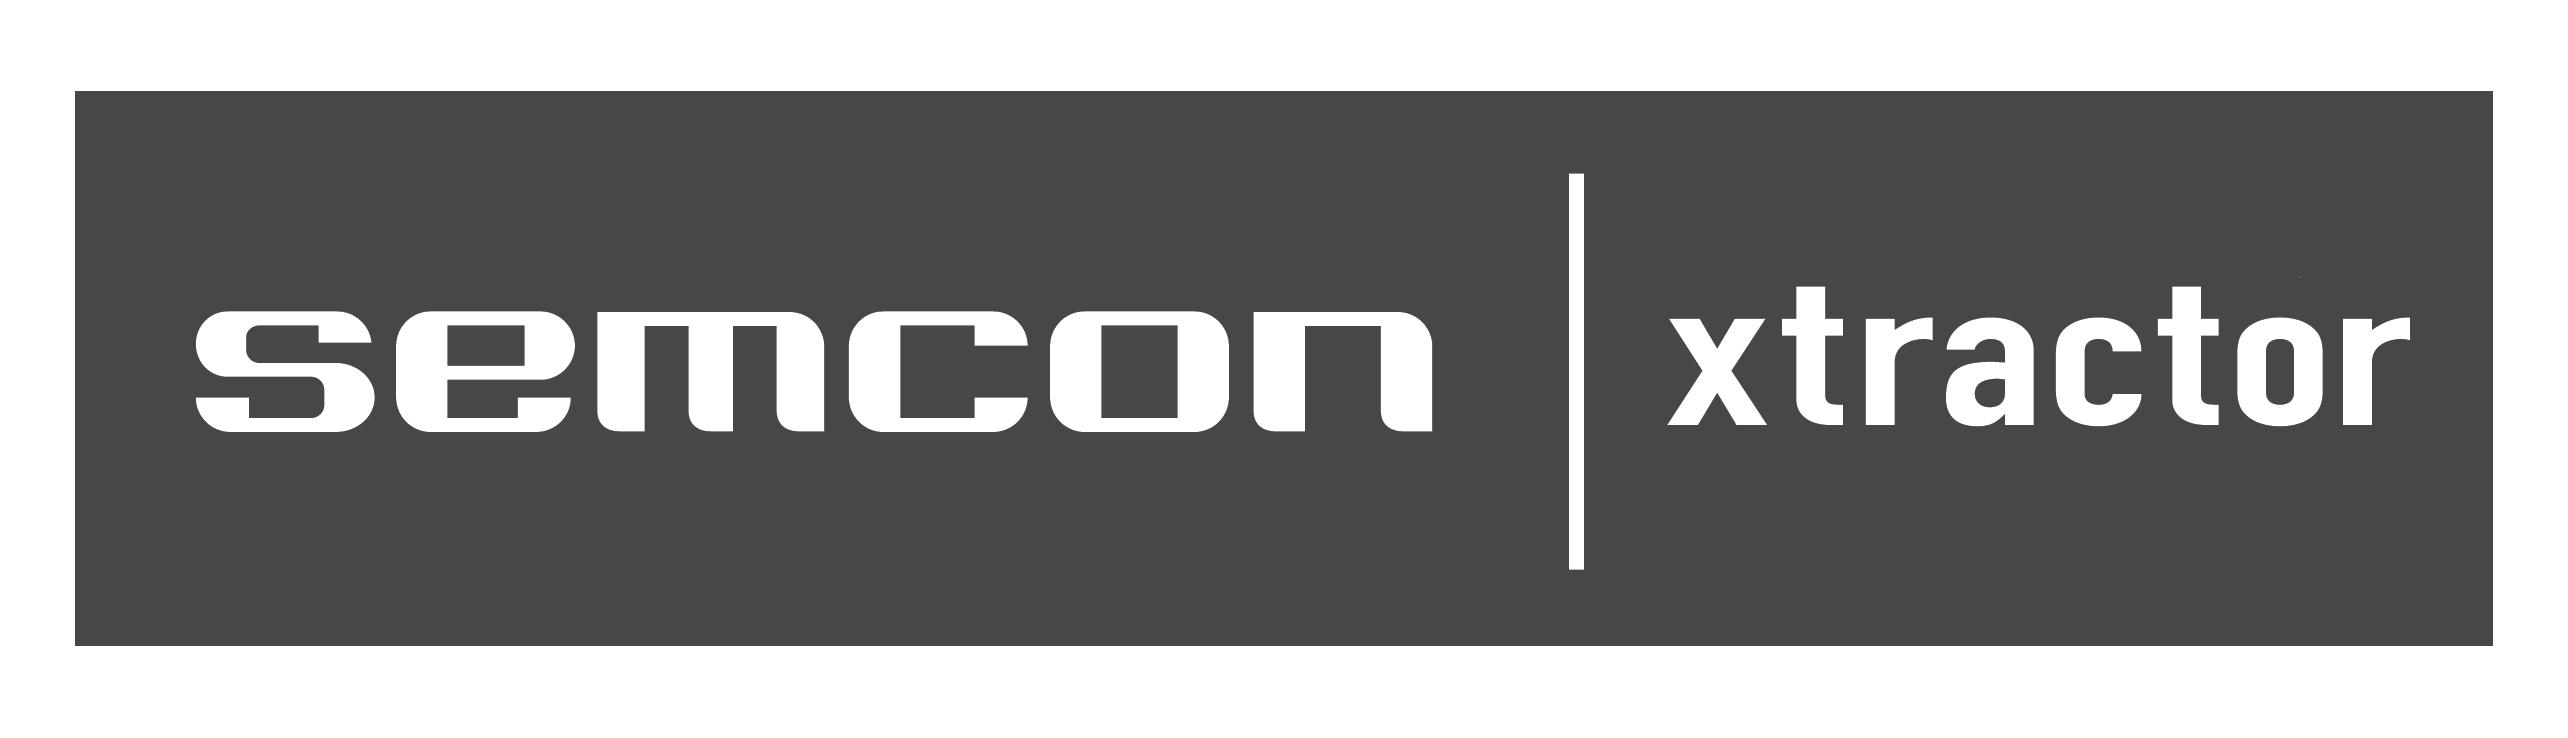 Xtractors webbplats, logotyp: Xtractor-Semcon..